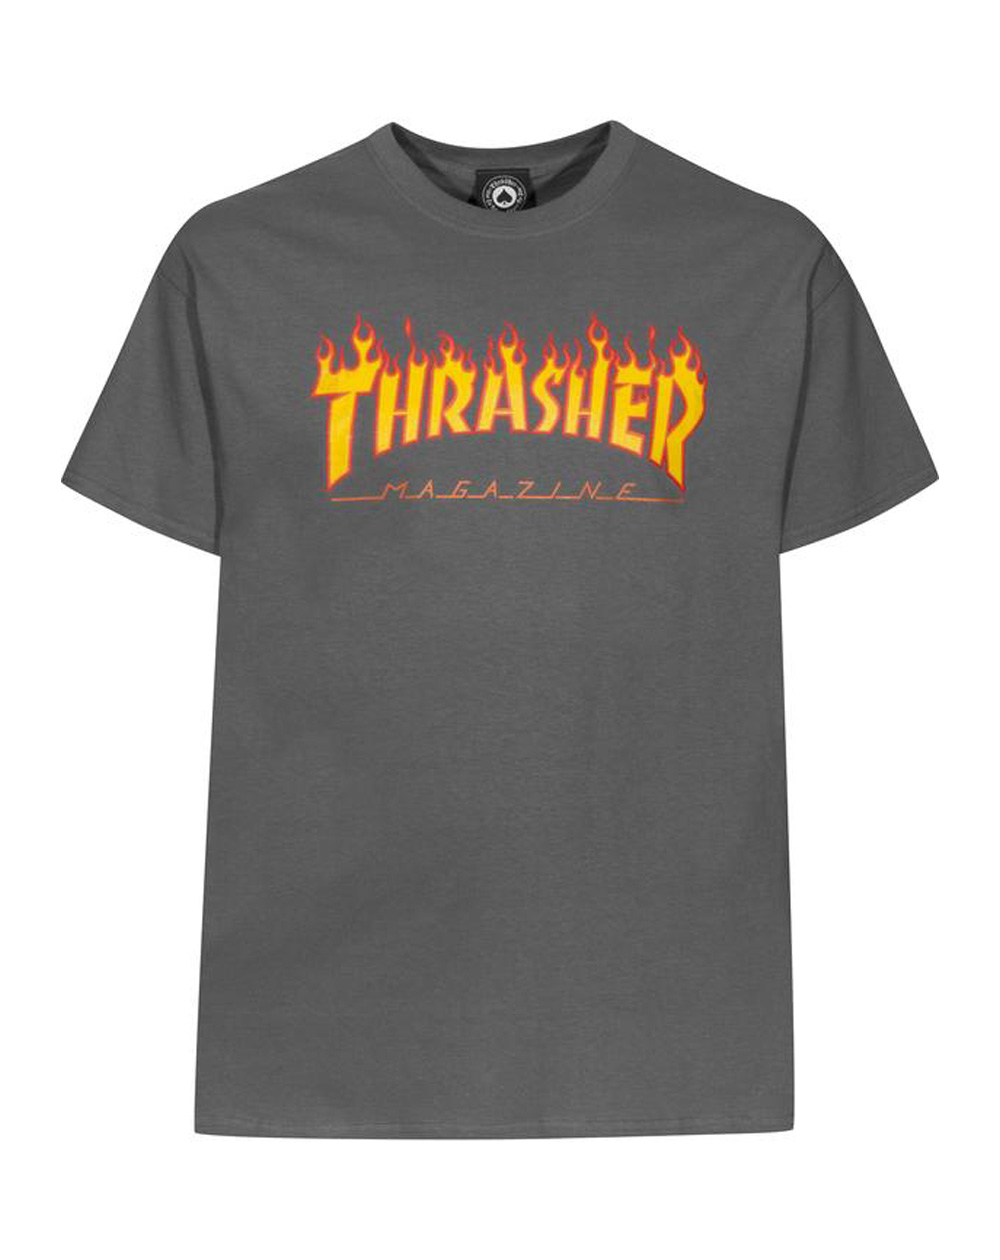 Thrasher Men's T-Shirt Flame Charcoal